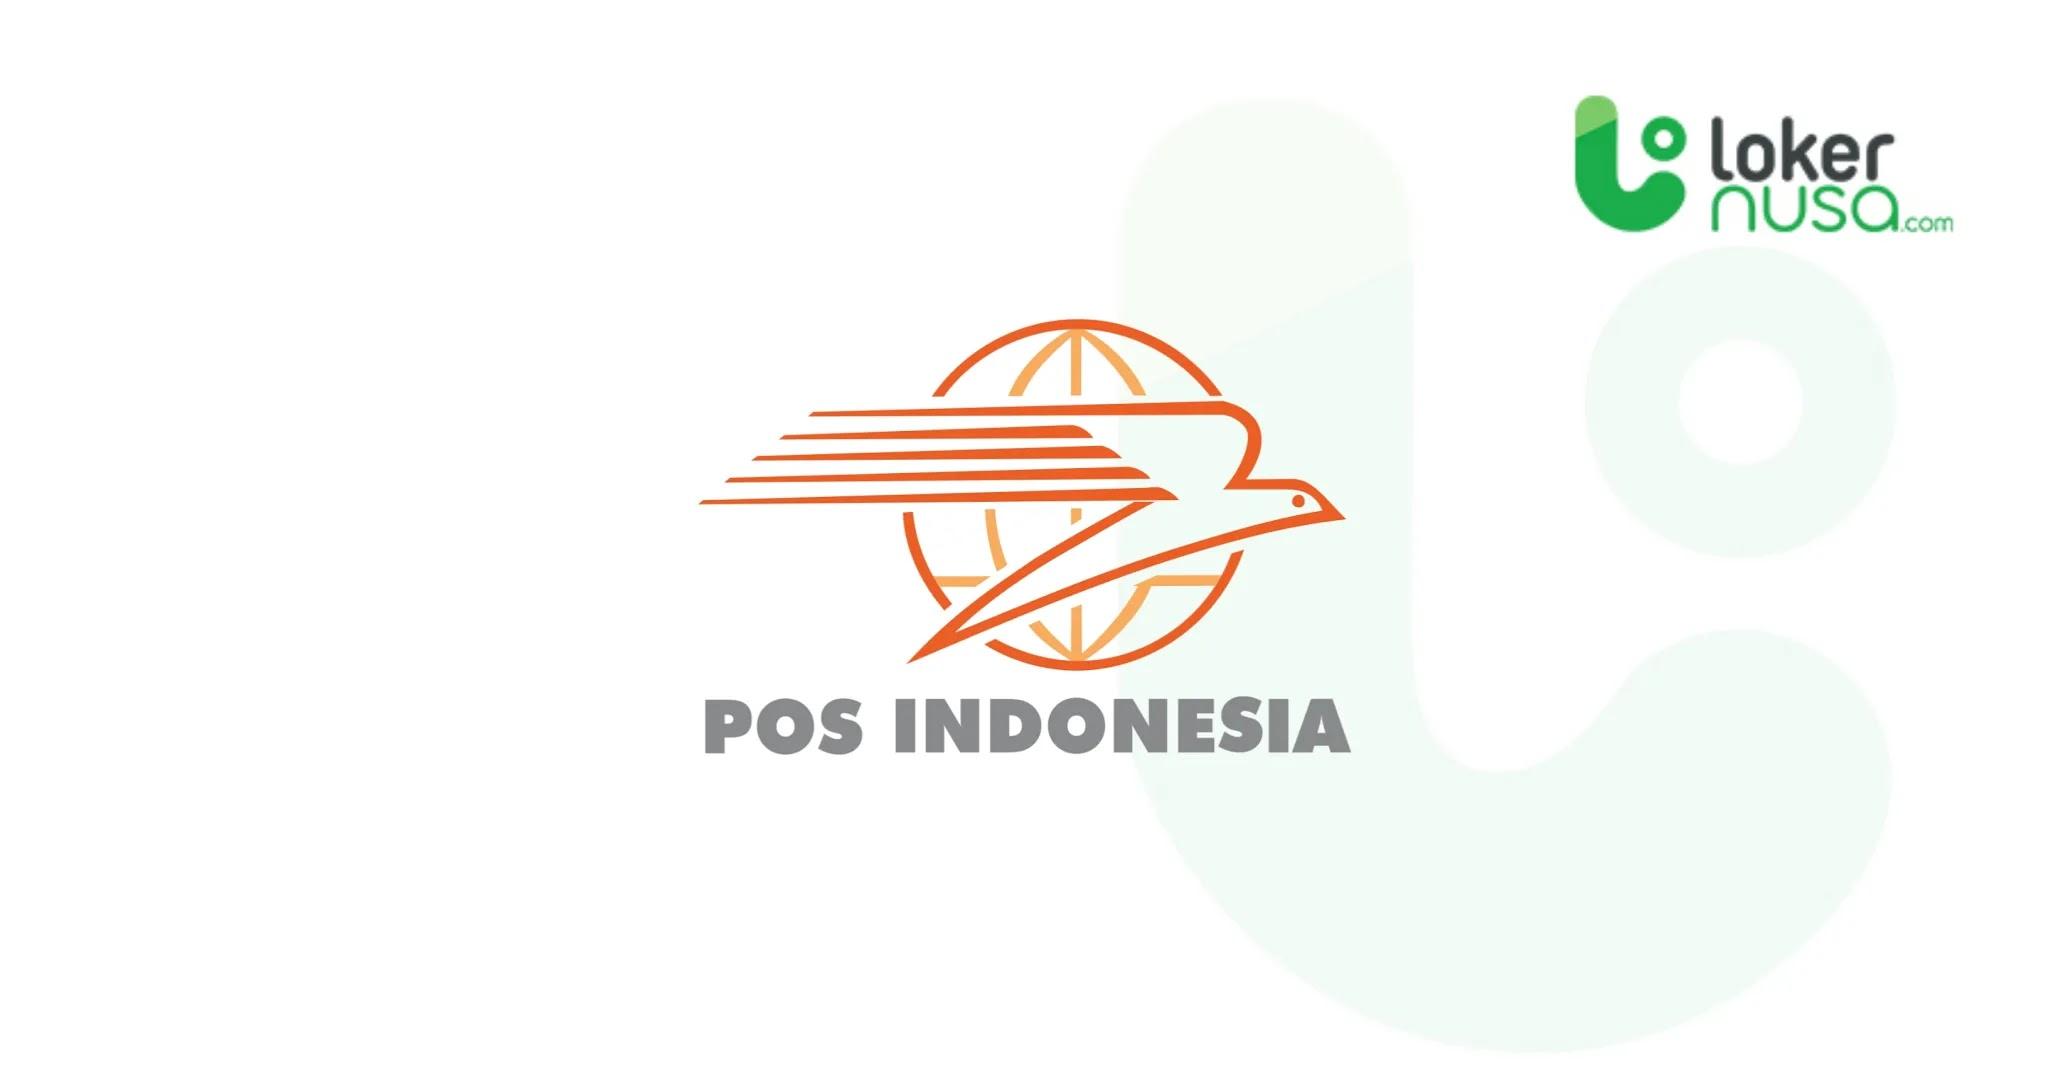 Lowongan Kerja Juli 2021 Pos Indonesia